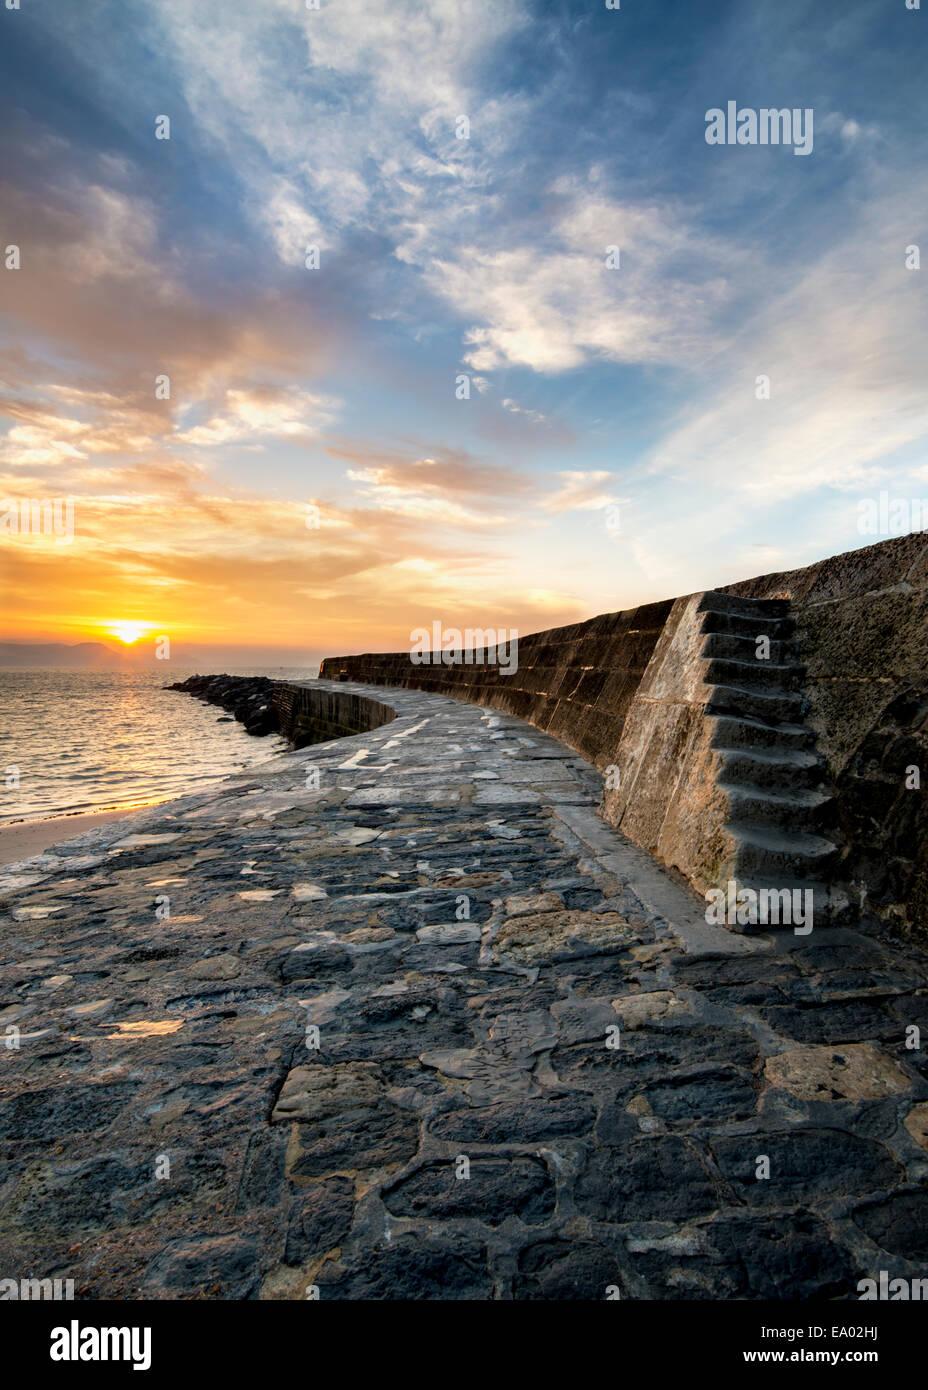 Sunrise at the Cobb, Lyme Regis - Stock Image